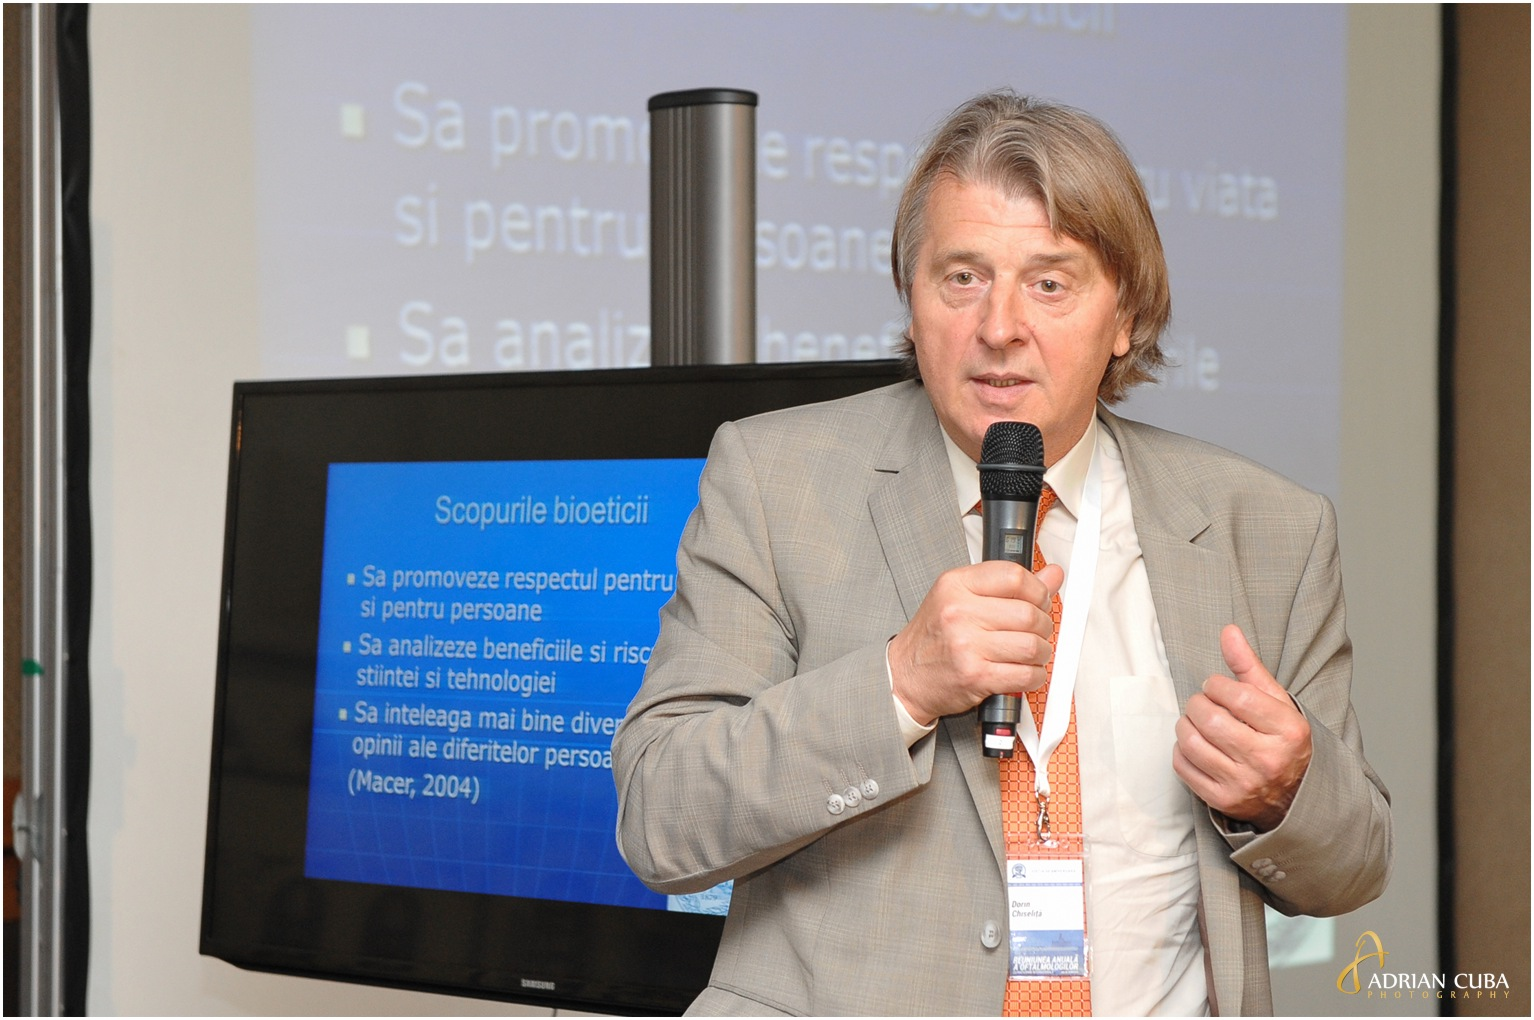 Prof. Dr. Dorin Chiseliță